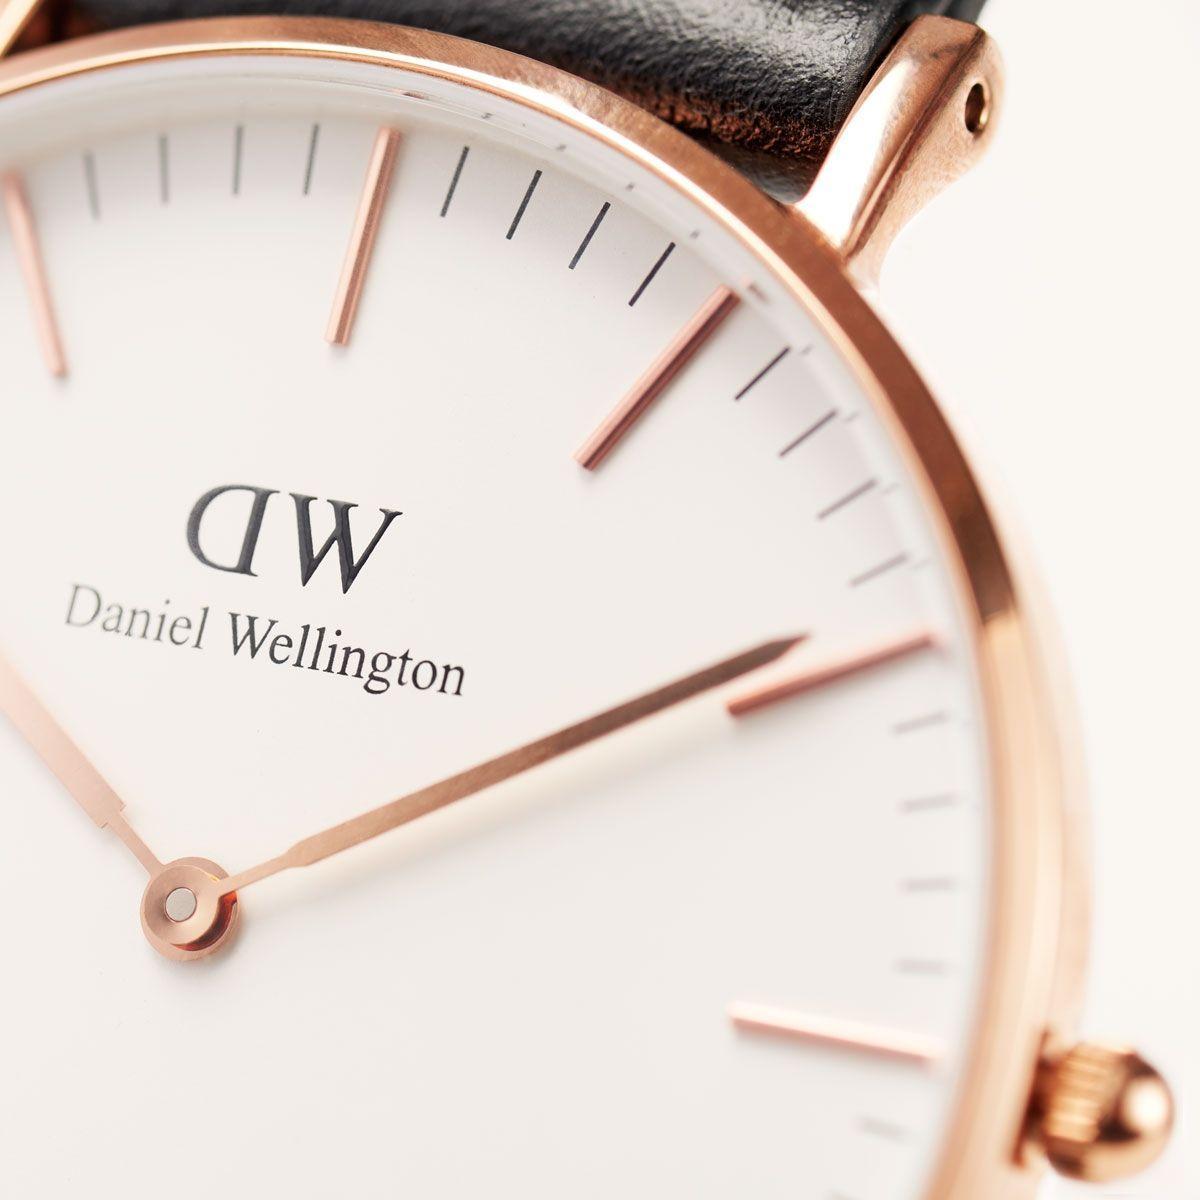 dw官网 dw手表官网 dw中国官网 dw官方旗舰店 DW DW官网  W Classic Southamptn RG 36mm